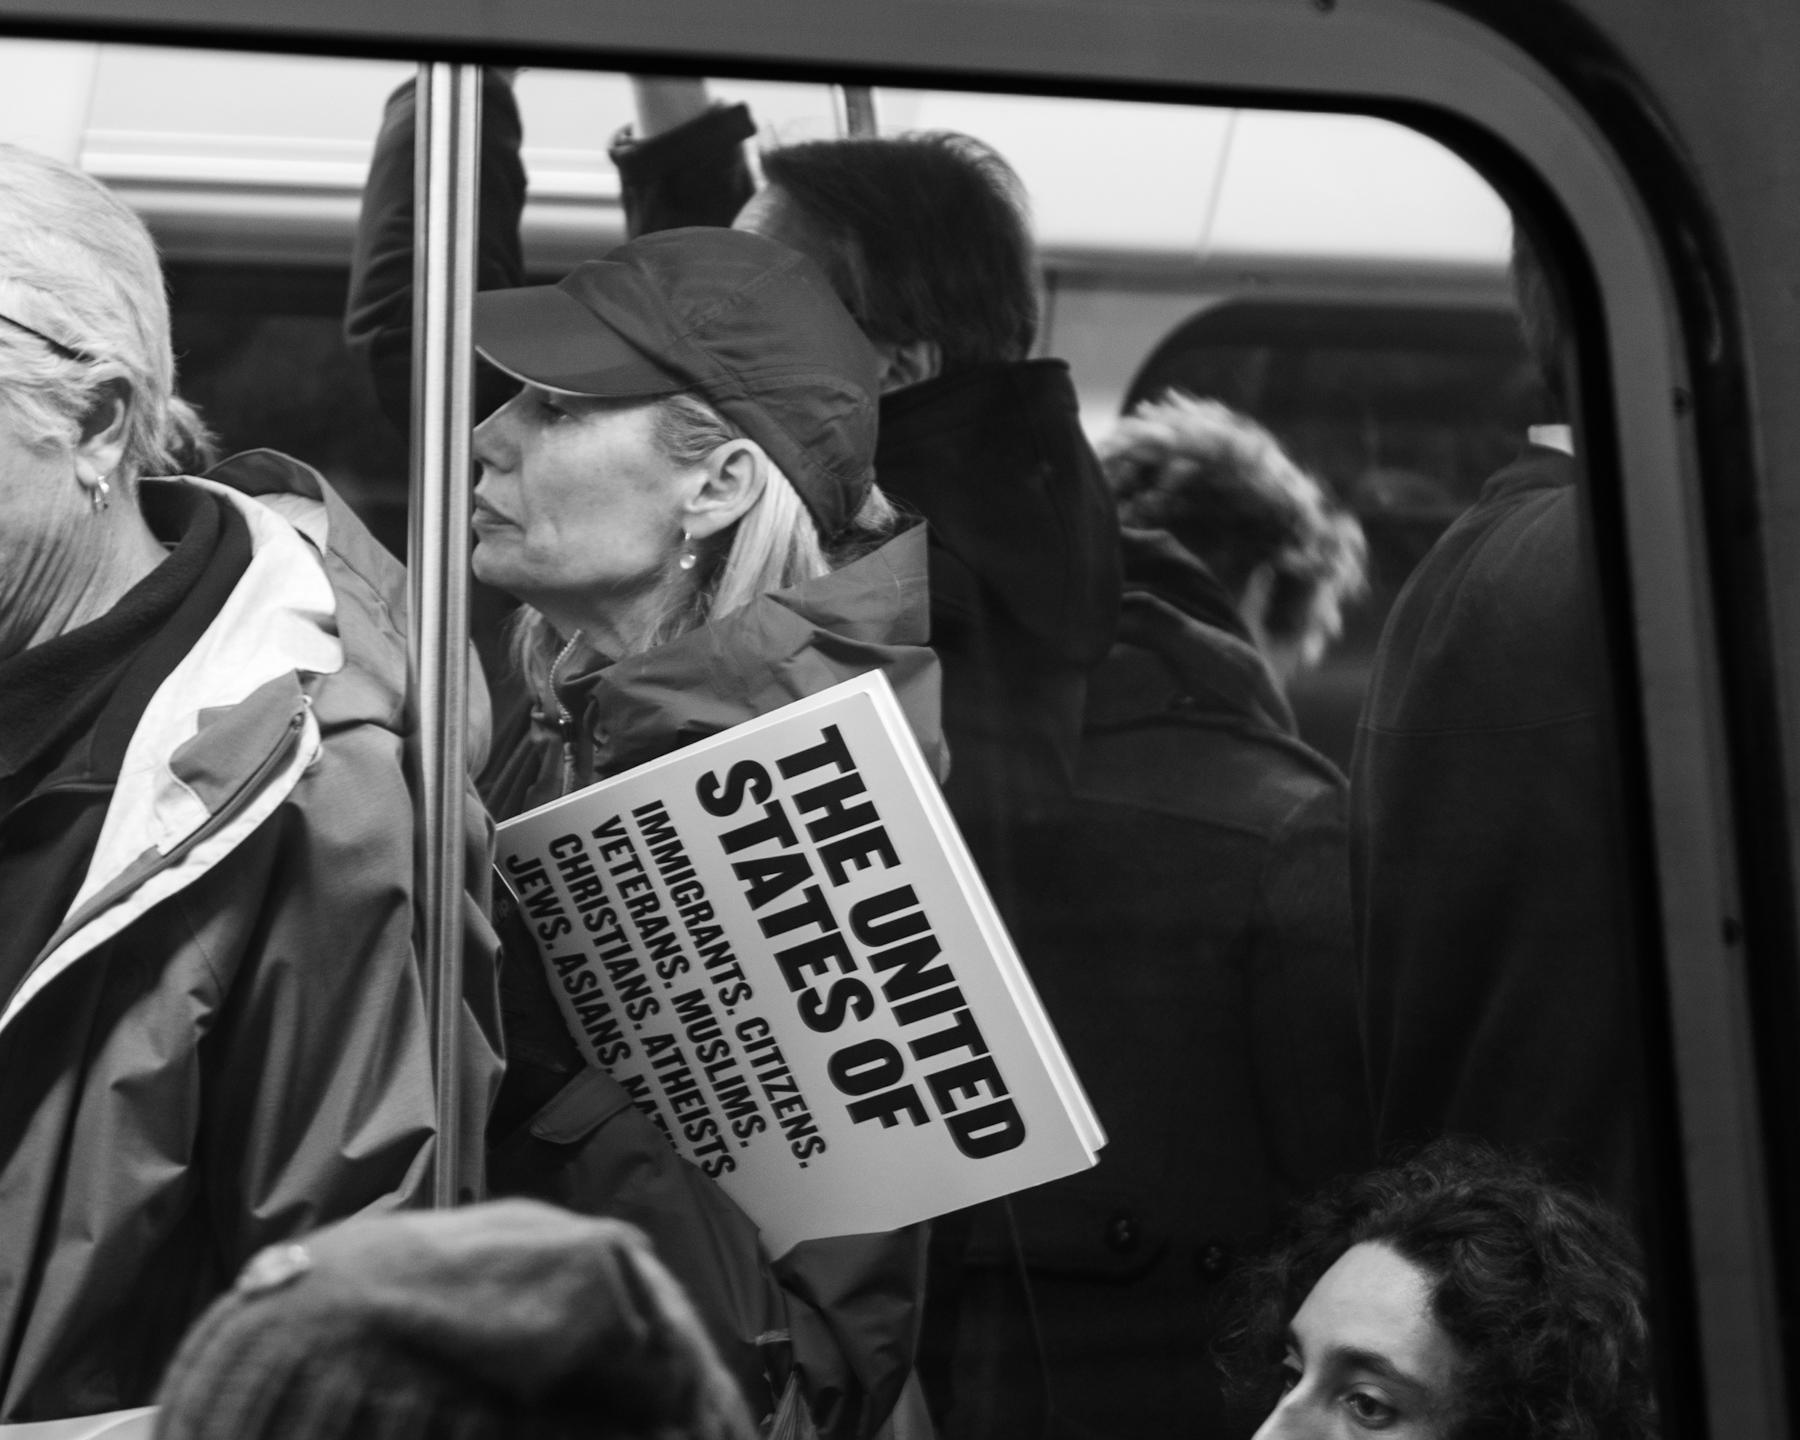 Womens March, Washington D.C., 1/21/17